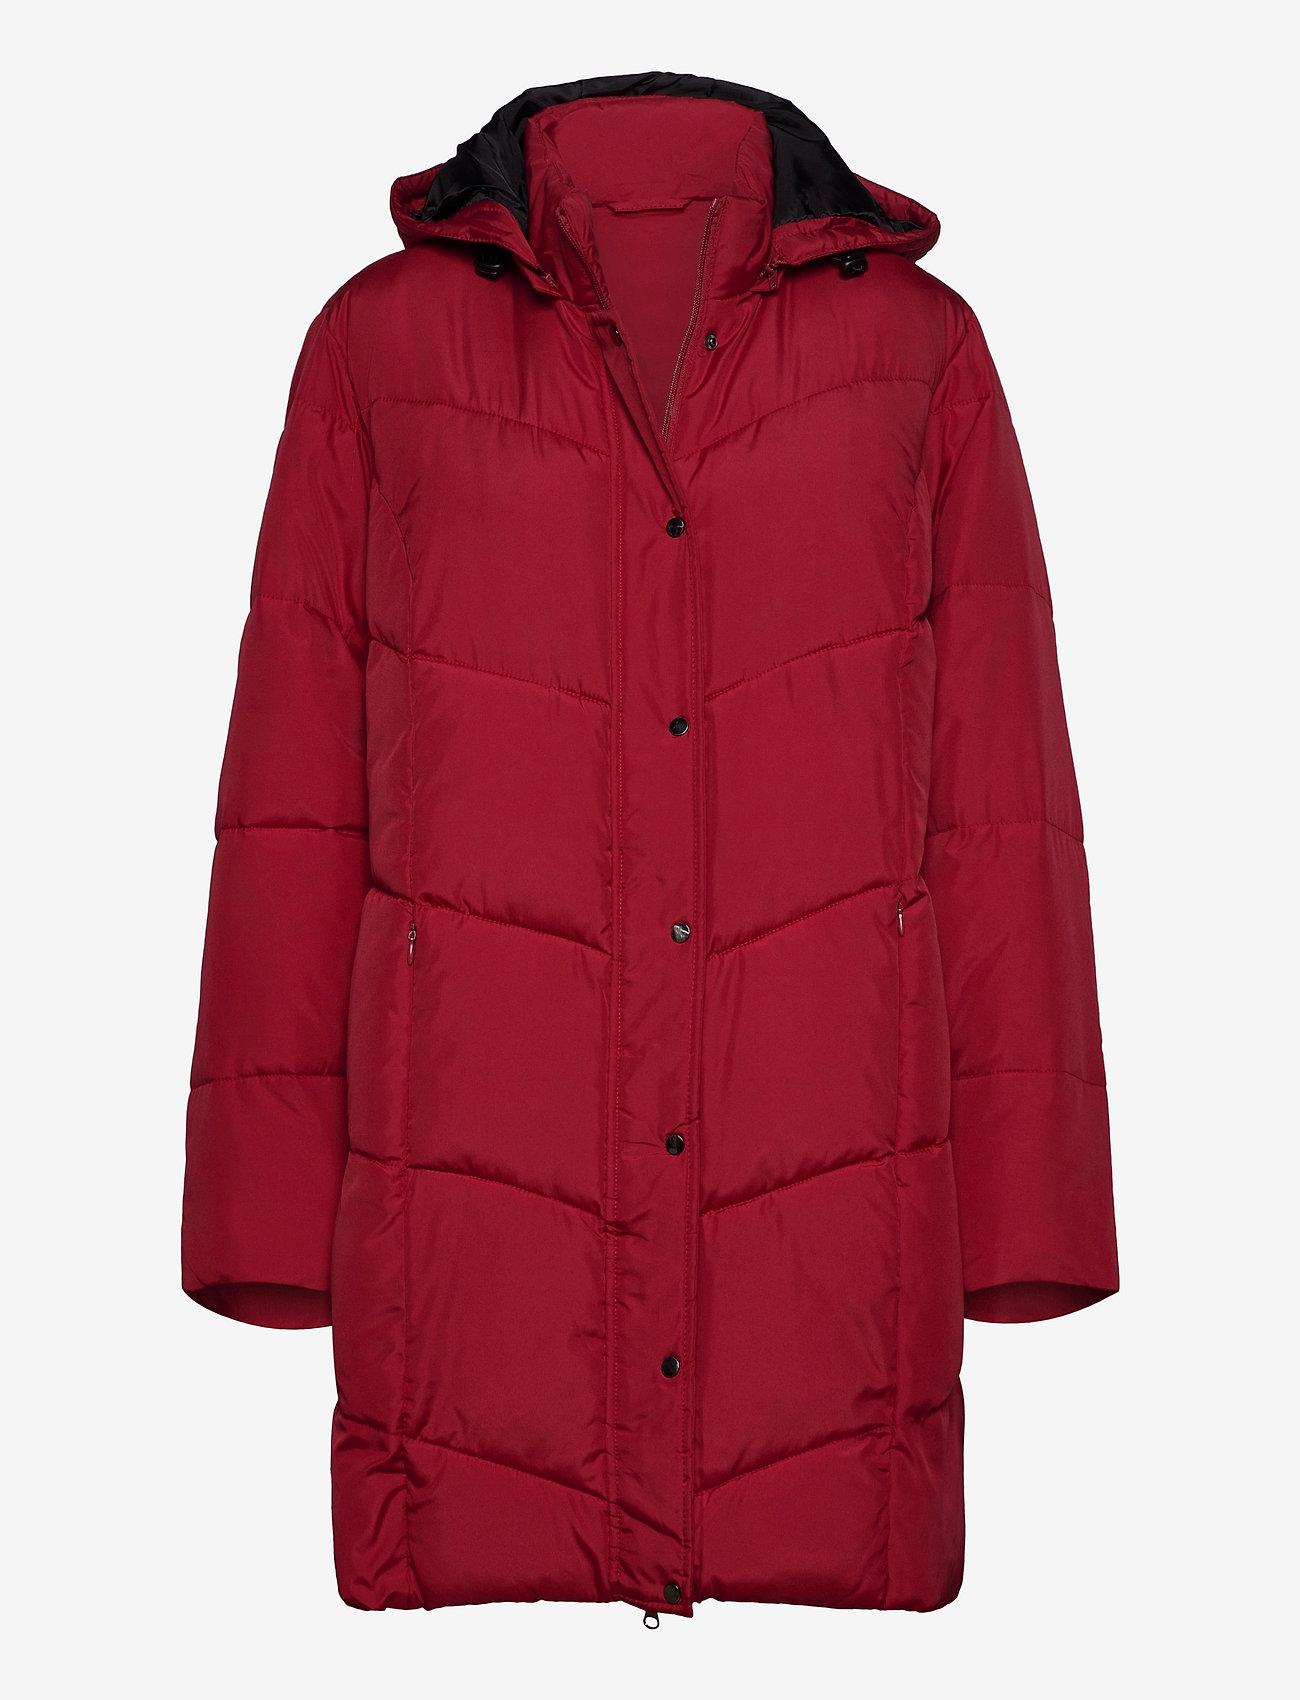 Brandtex - Coat Outerwear Heavy - dynefrakke - red - 0